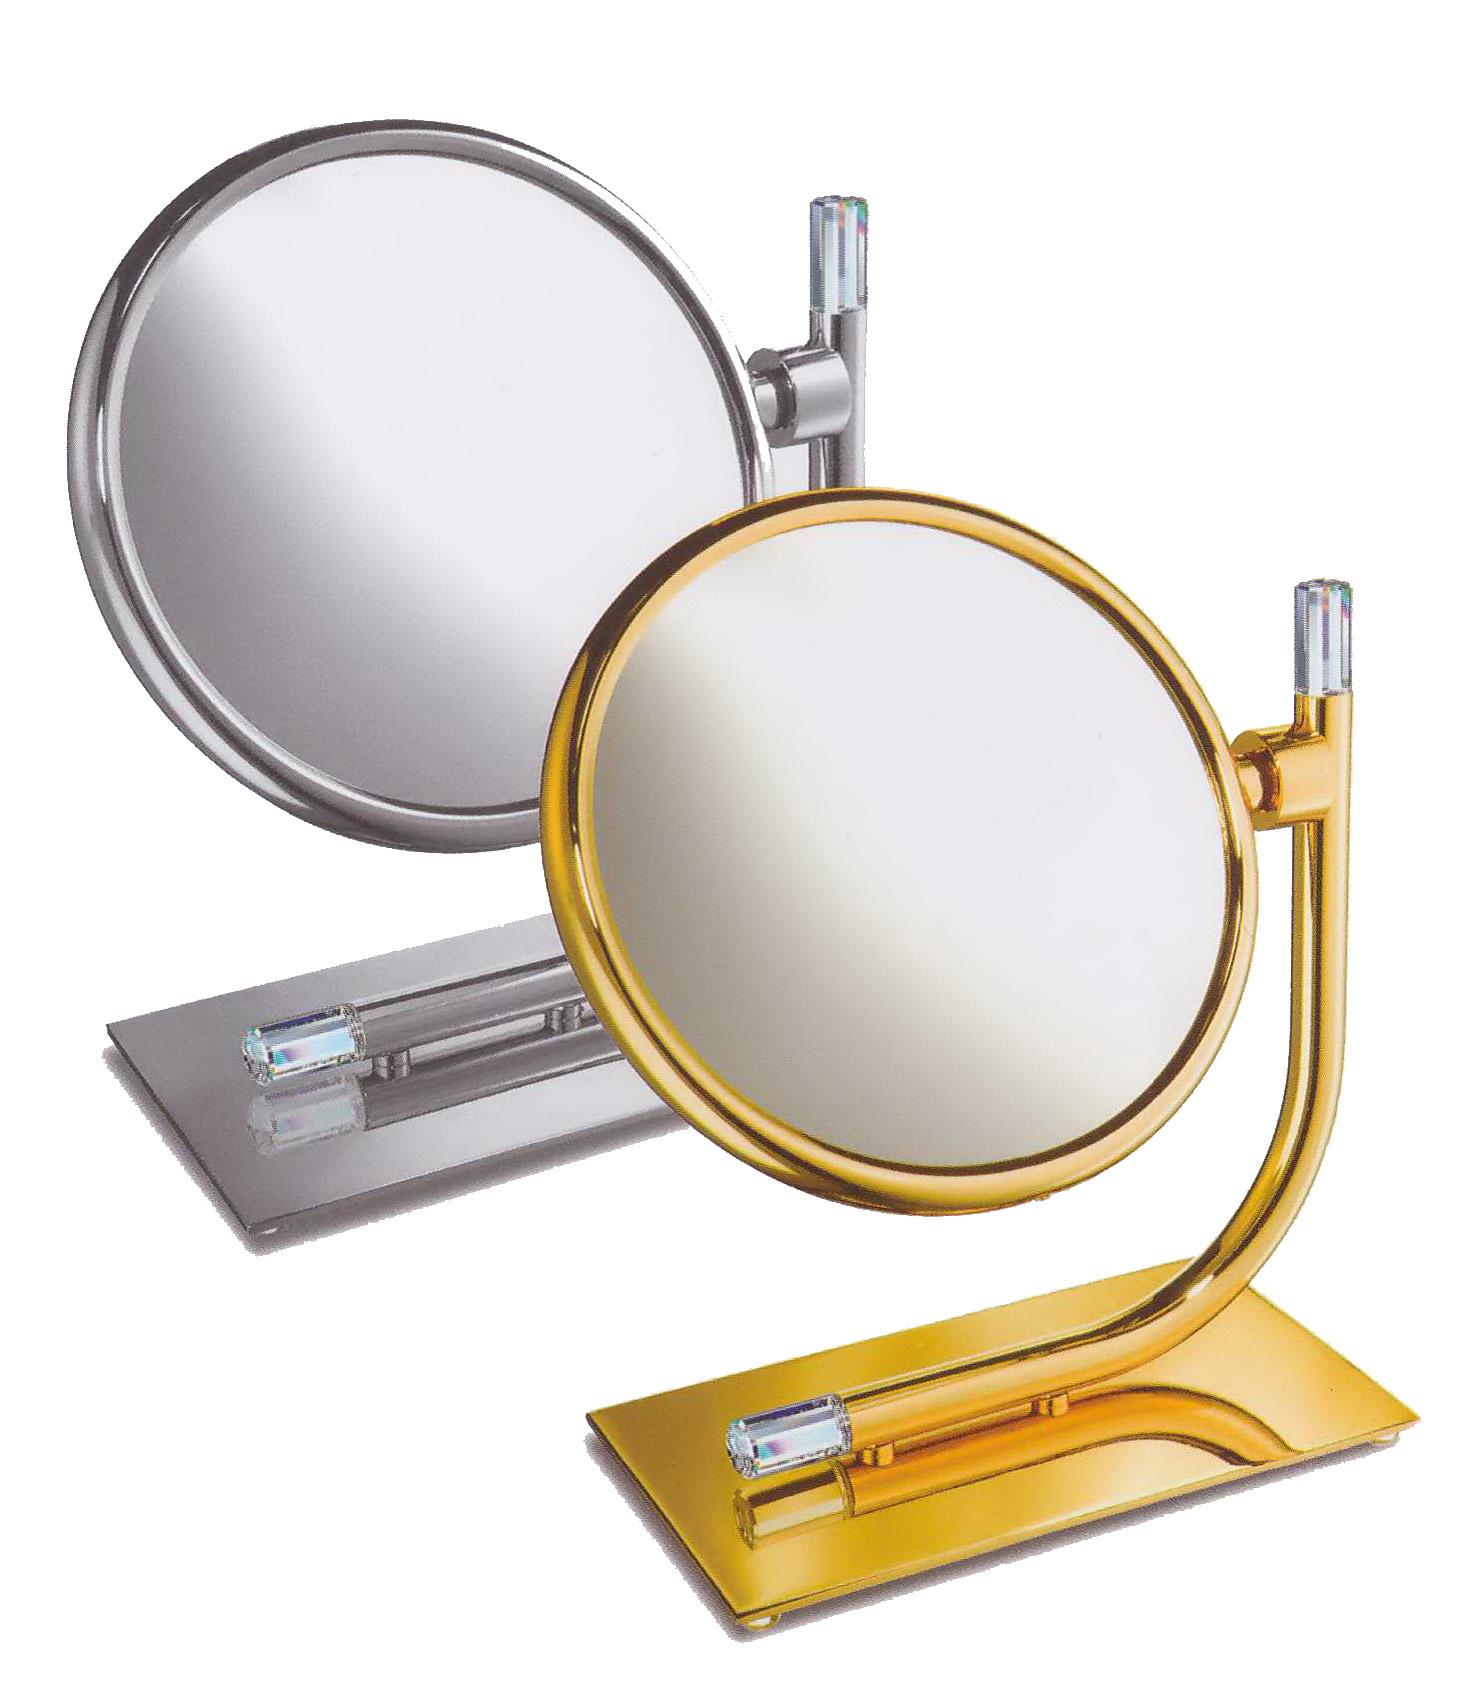 Зеркала Зеркало косметическое Windisch 99636O 5X Concept elitnoe-zerkalo-kosmeticheskoe-99636o-5x-concept-ot-windisch-ispaniya.jpg